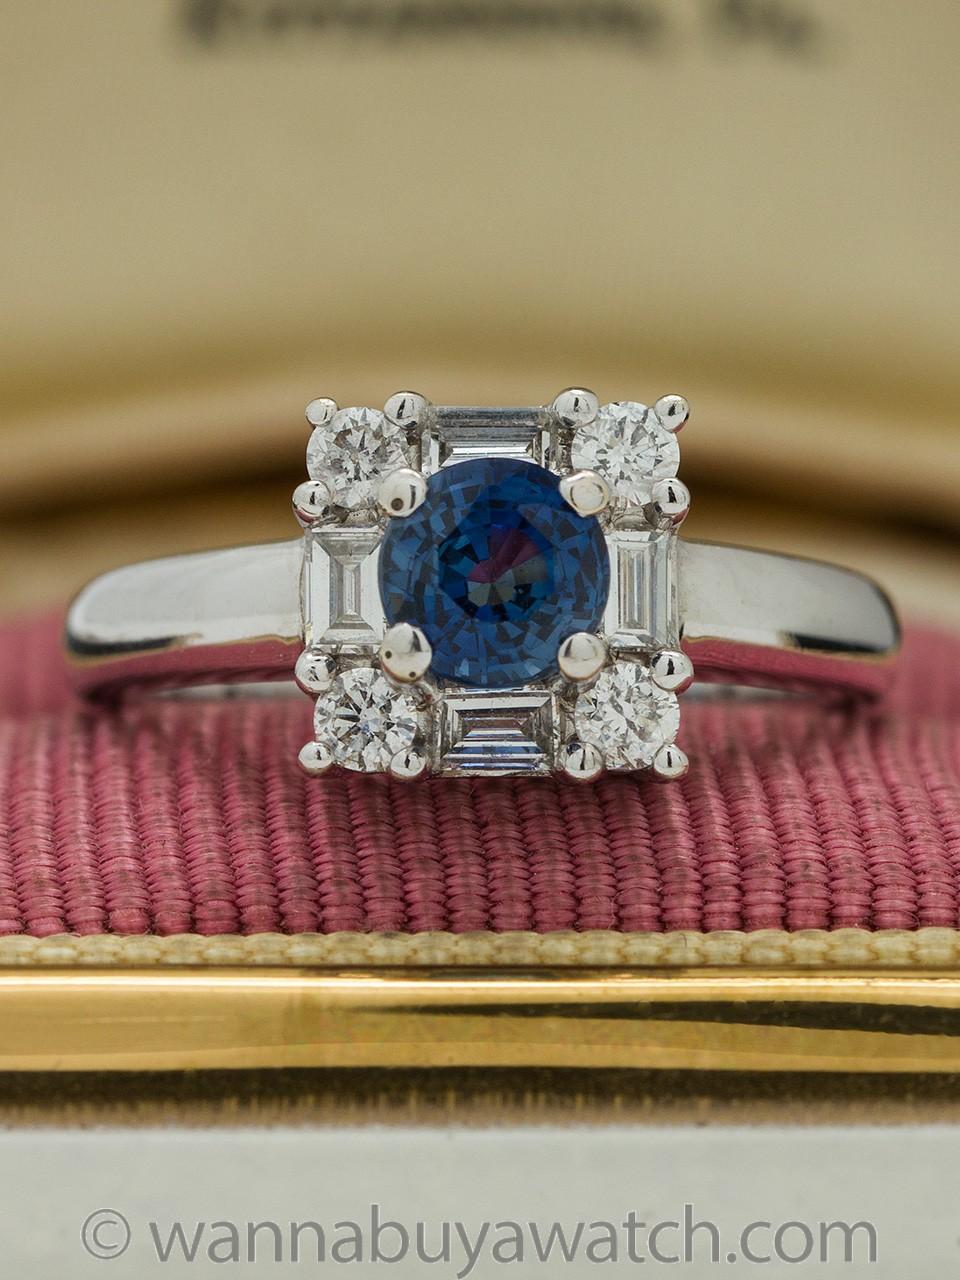 Gorgeous 18K WG Sapphire & Diamond Ring circa 2000s